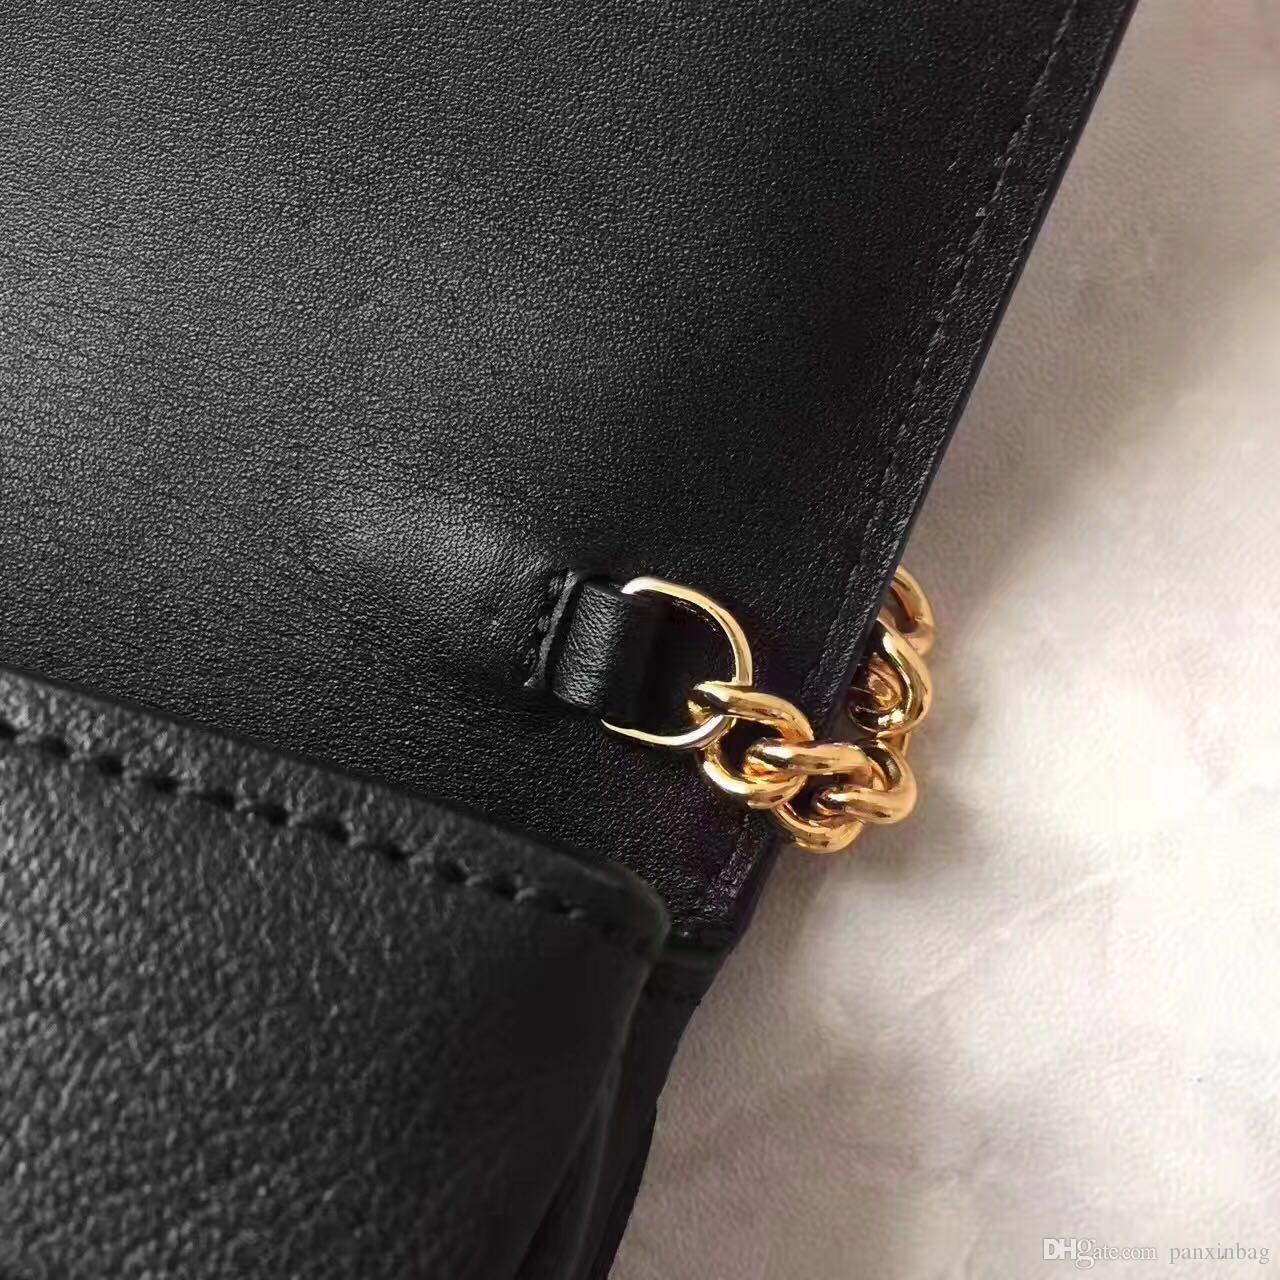 2017 latest solid color tassel phone bag multi-purpose shoulder purse leisure casual clamshell ladies bag